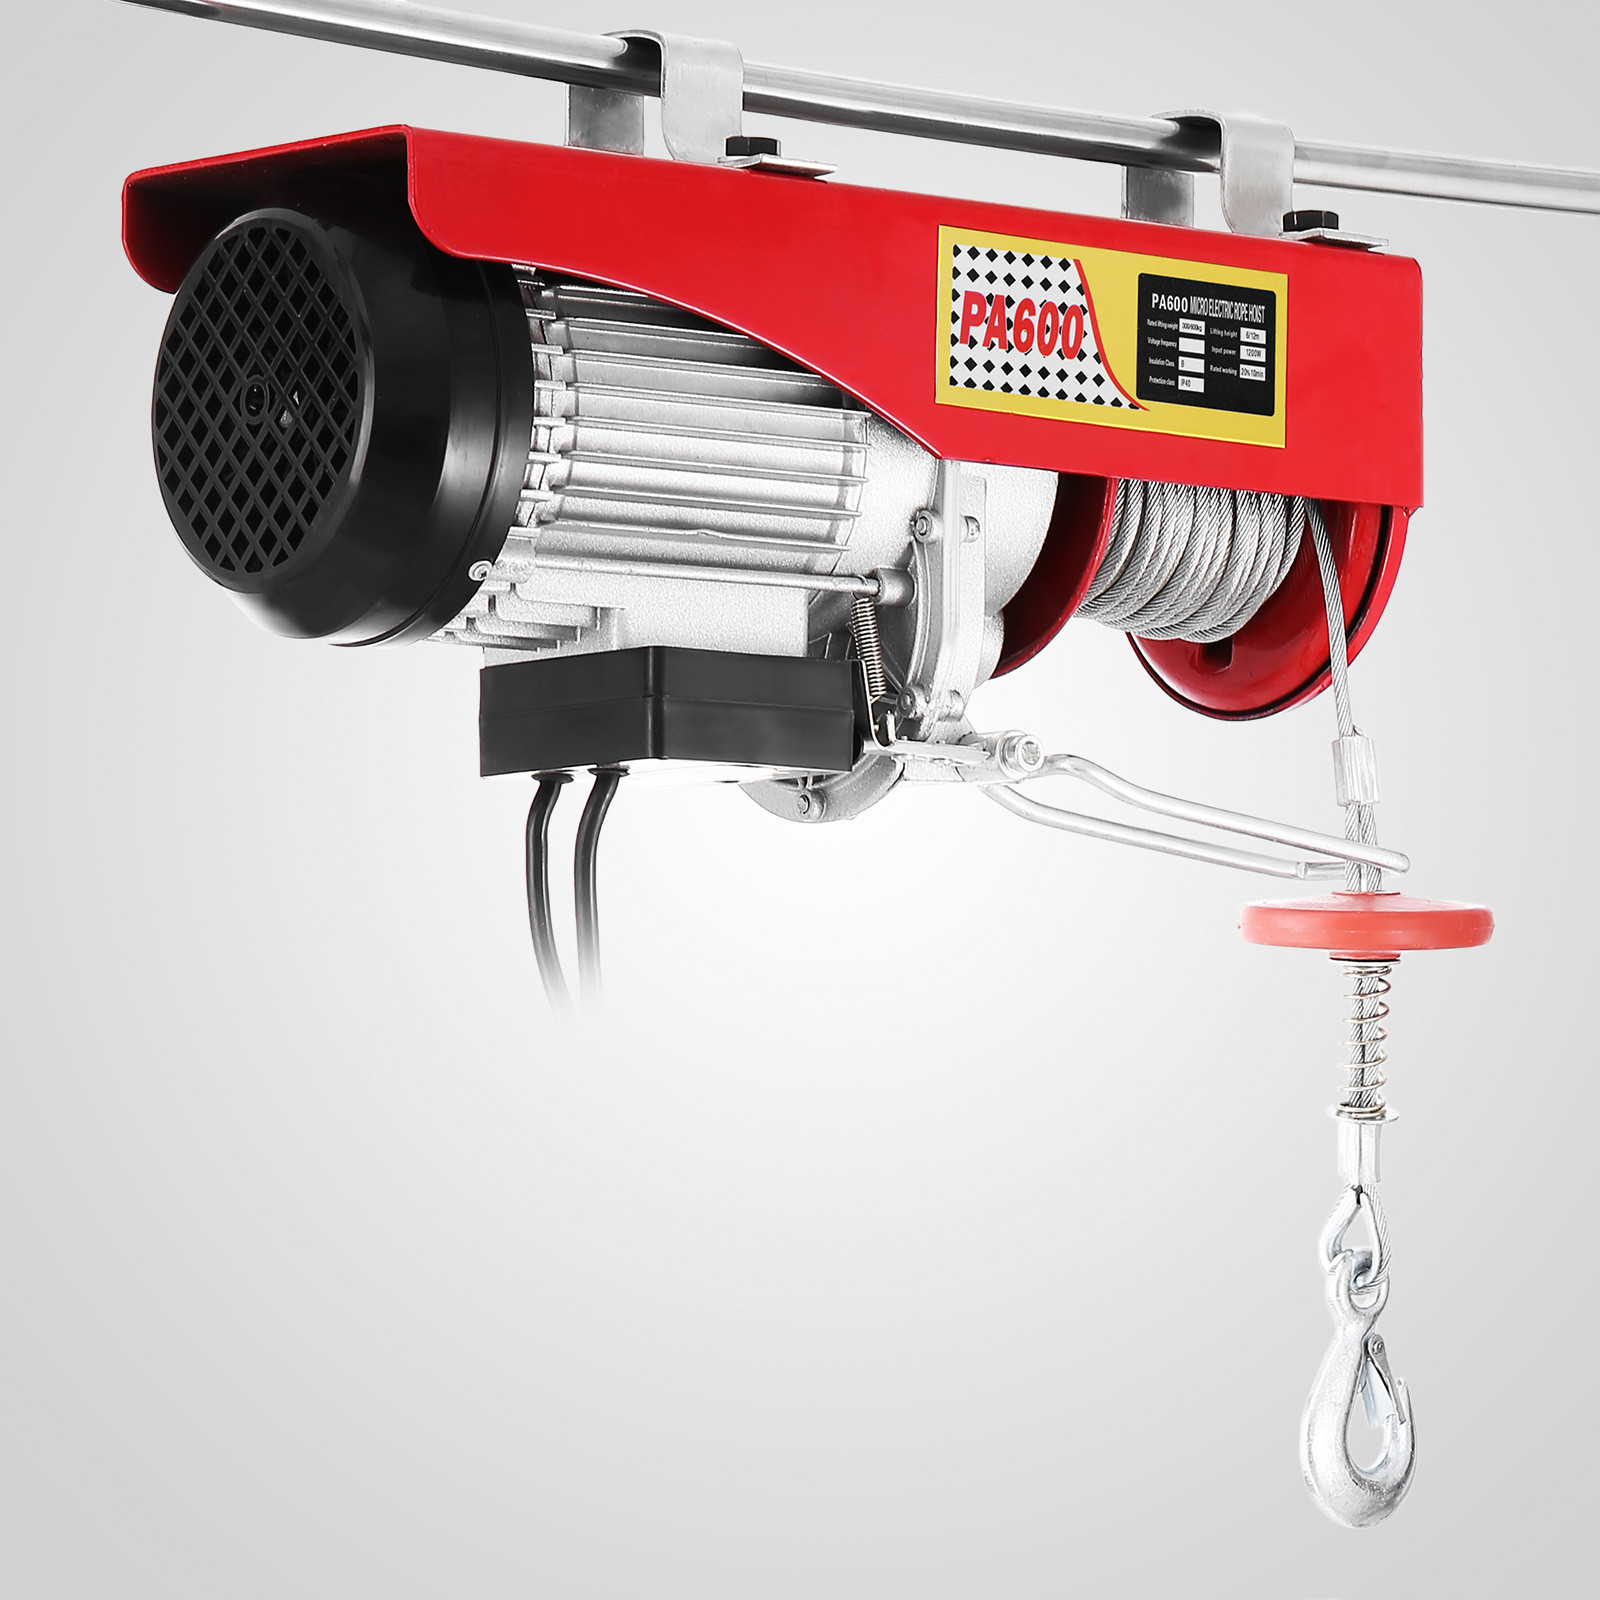 100kg-900kg-Electric-Hoist-Winch-Lifting-Engine-Crane-Cable-Lift-Hook-Garage miniature 41